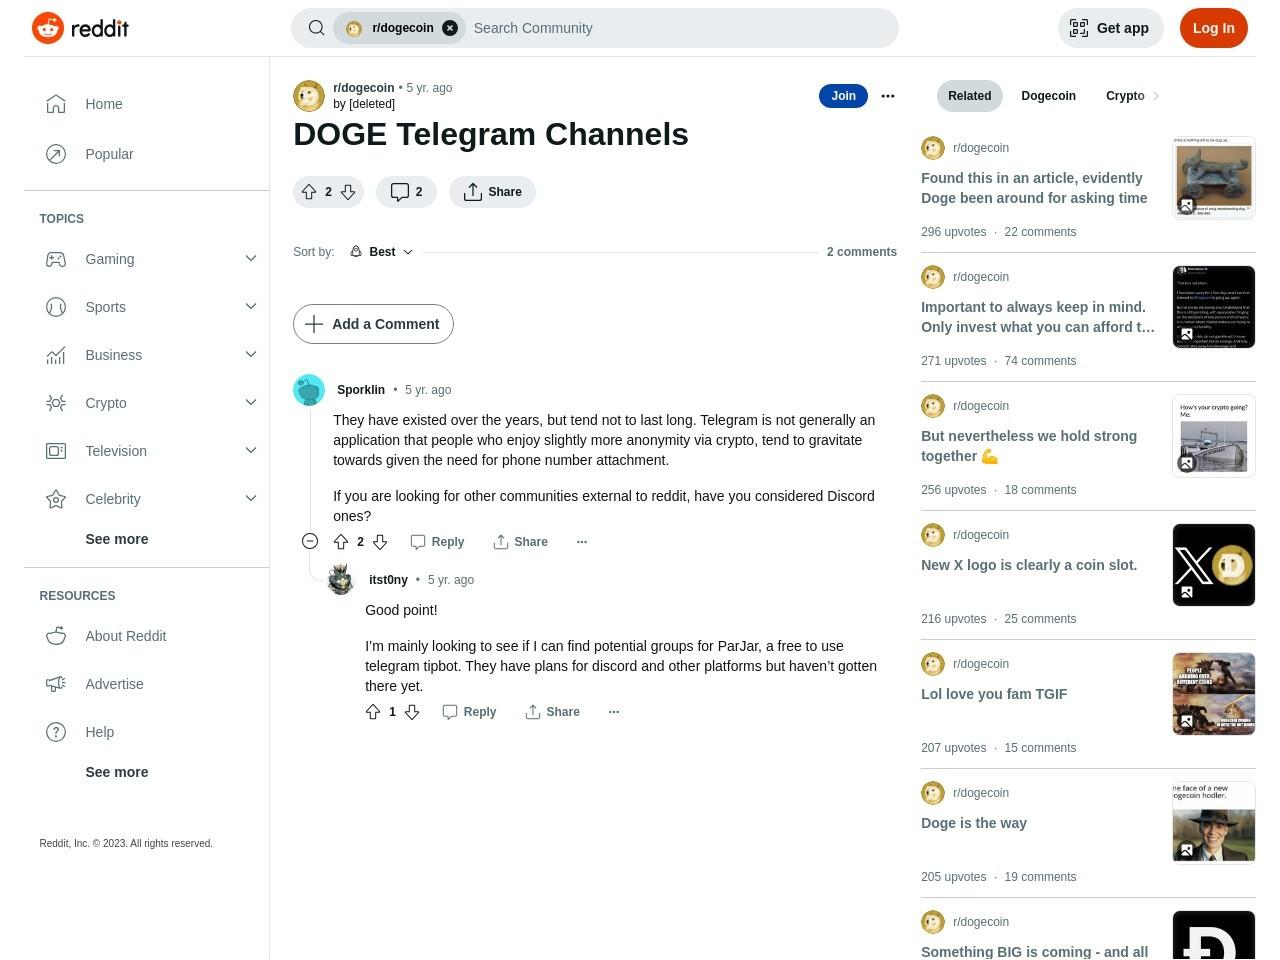 DOGE Telegram Channels